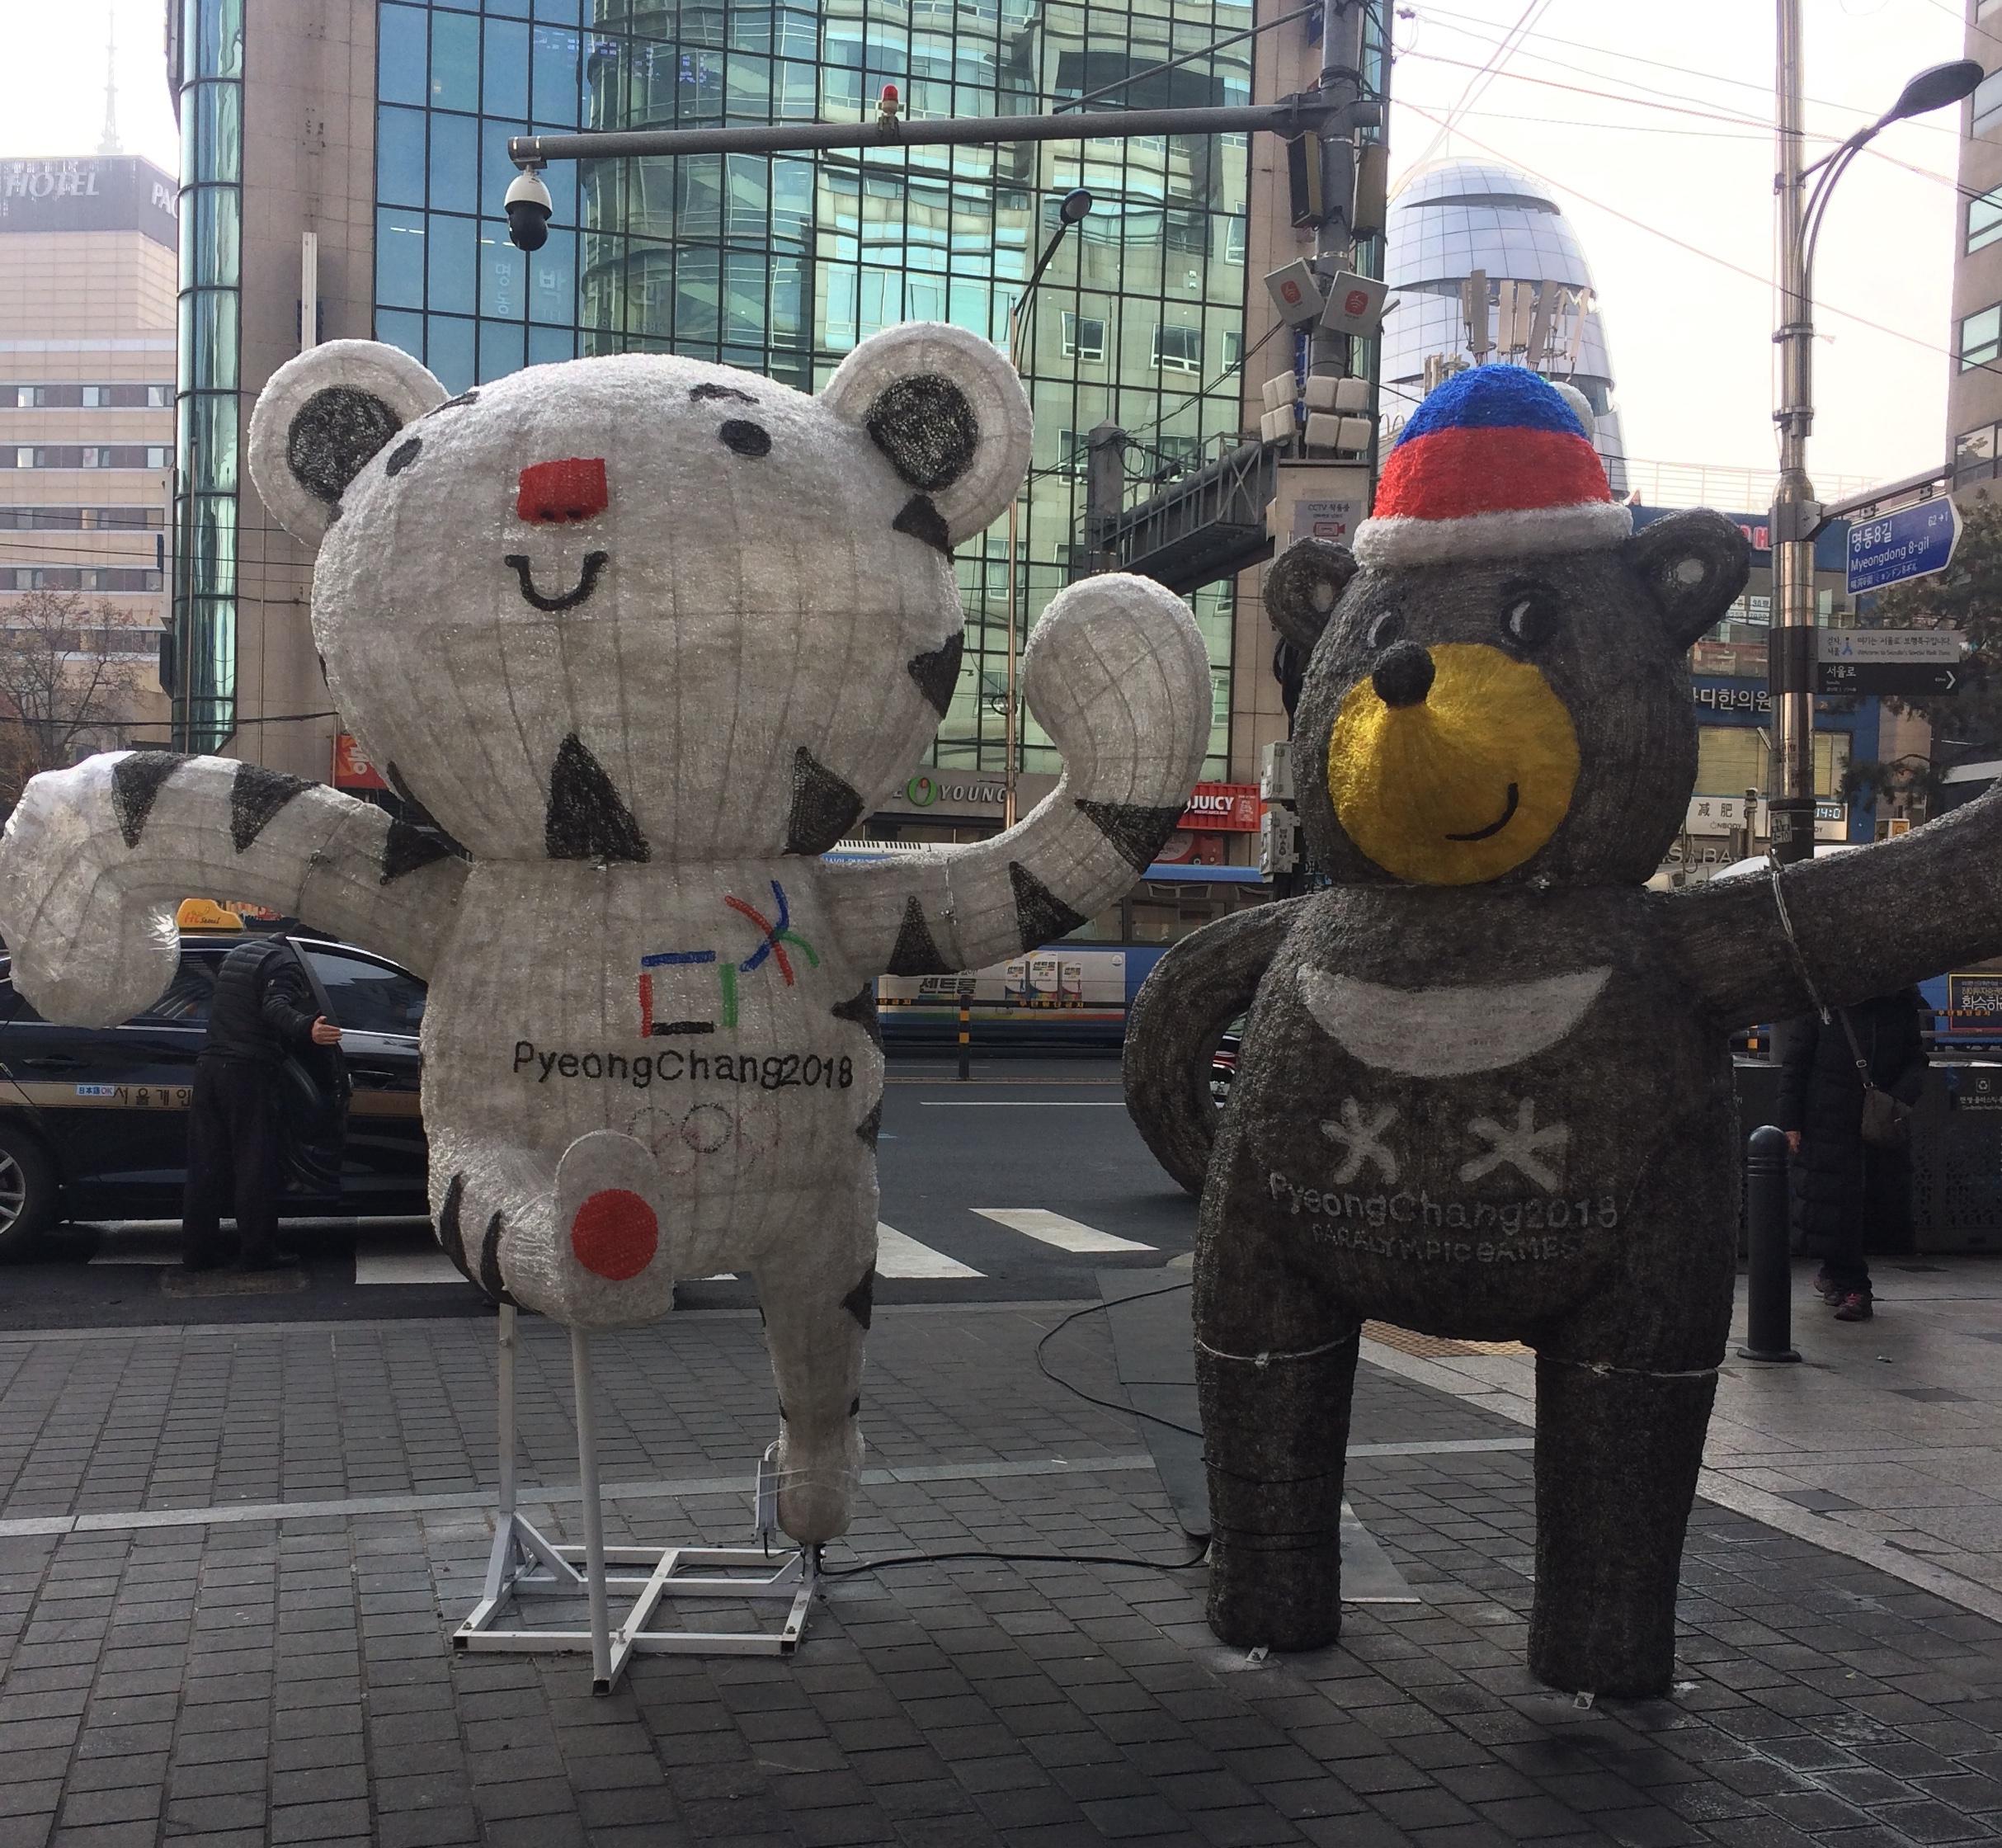 PyeongChang Olympics Mascots © Flyga Twiga LLC